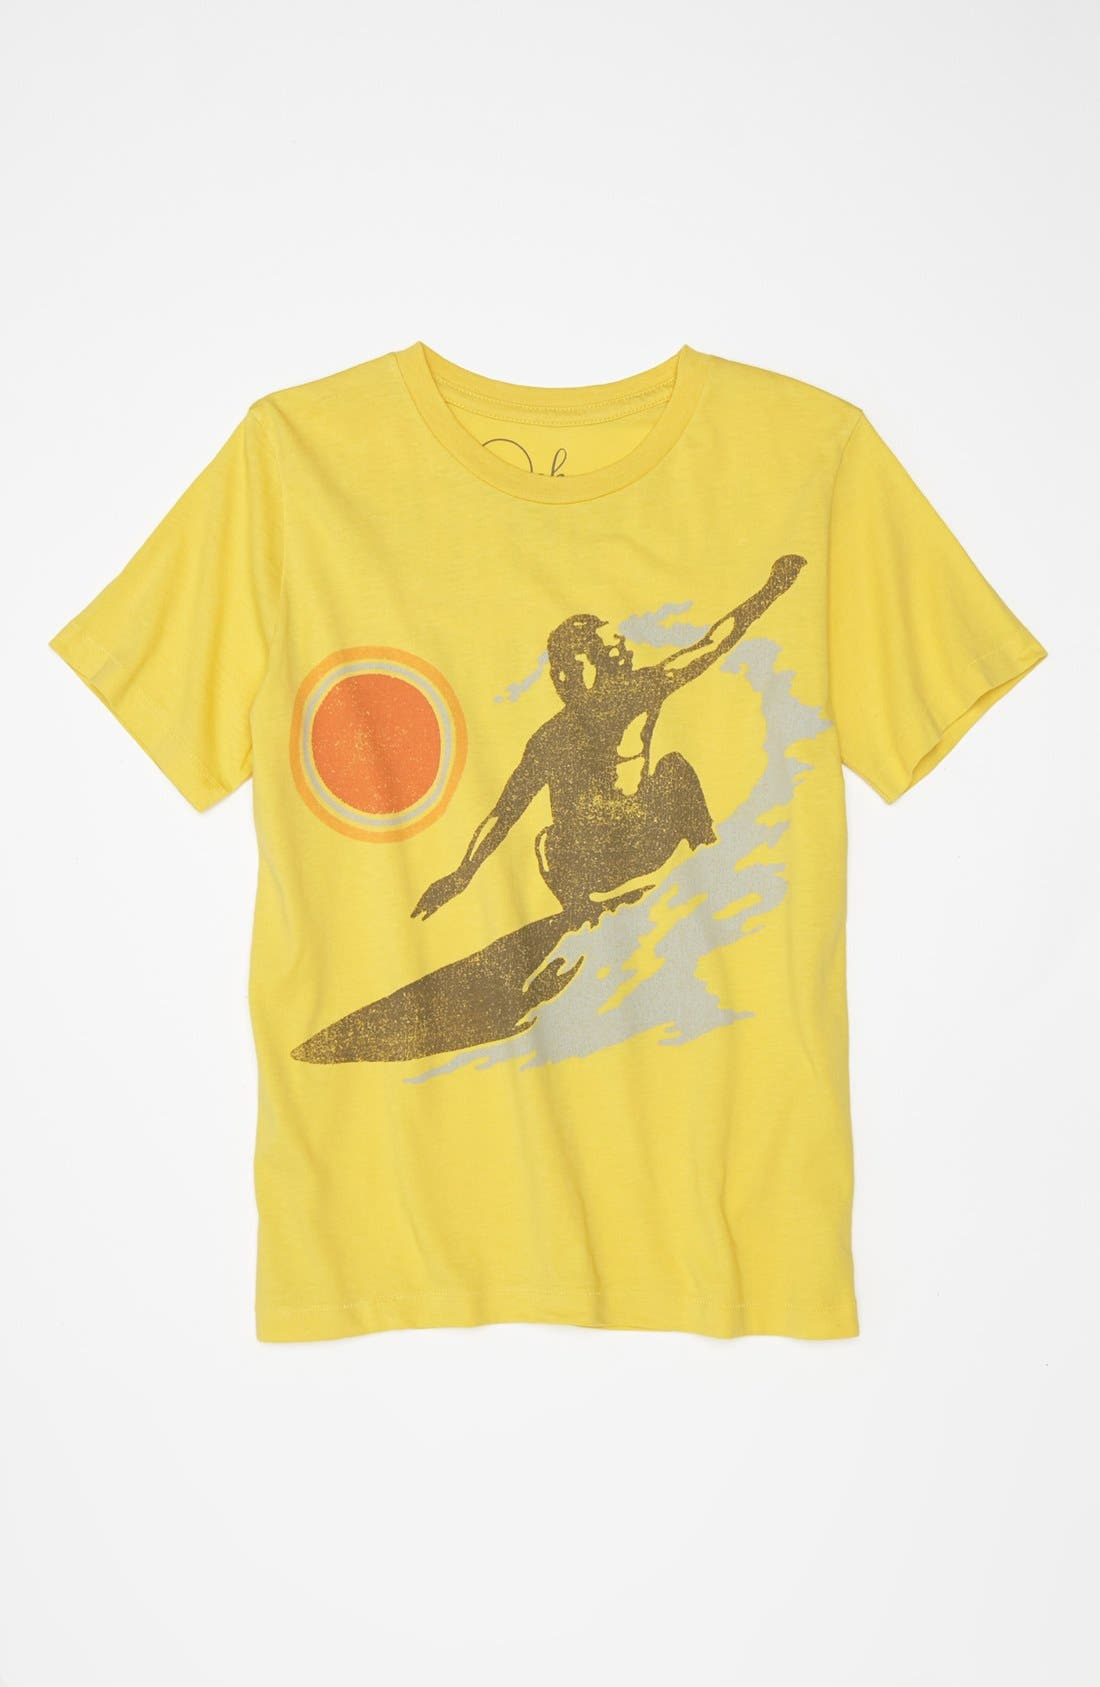 Alternate Image 1 Selected - Peek 'Cape Hatteras' T-Shirt (Toddler Boys, Little Boys & Big Boys)